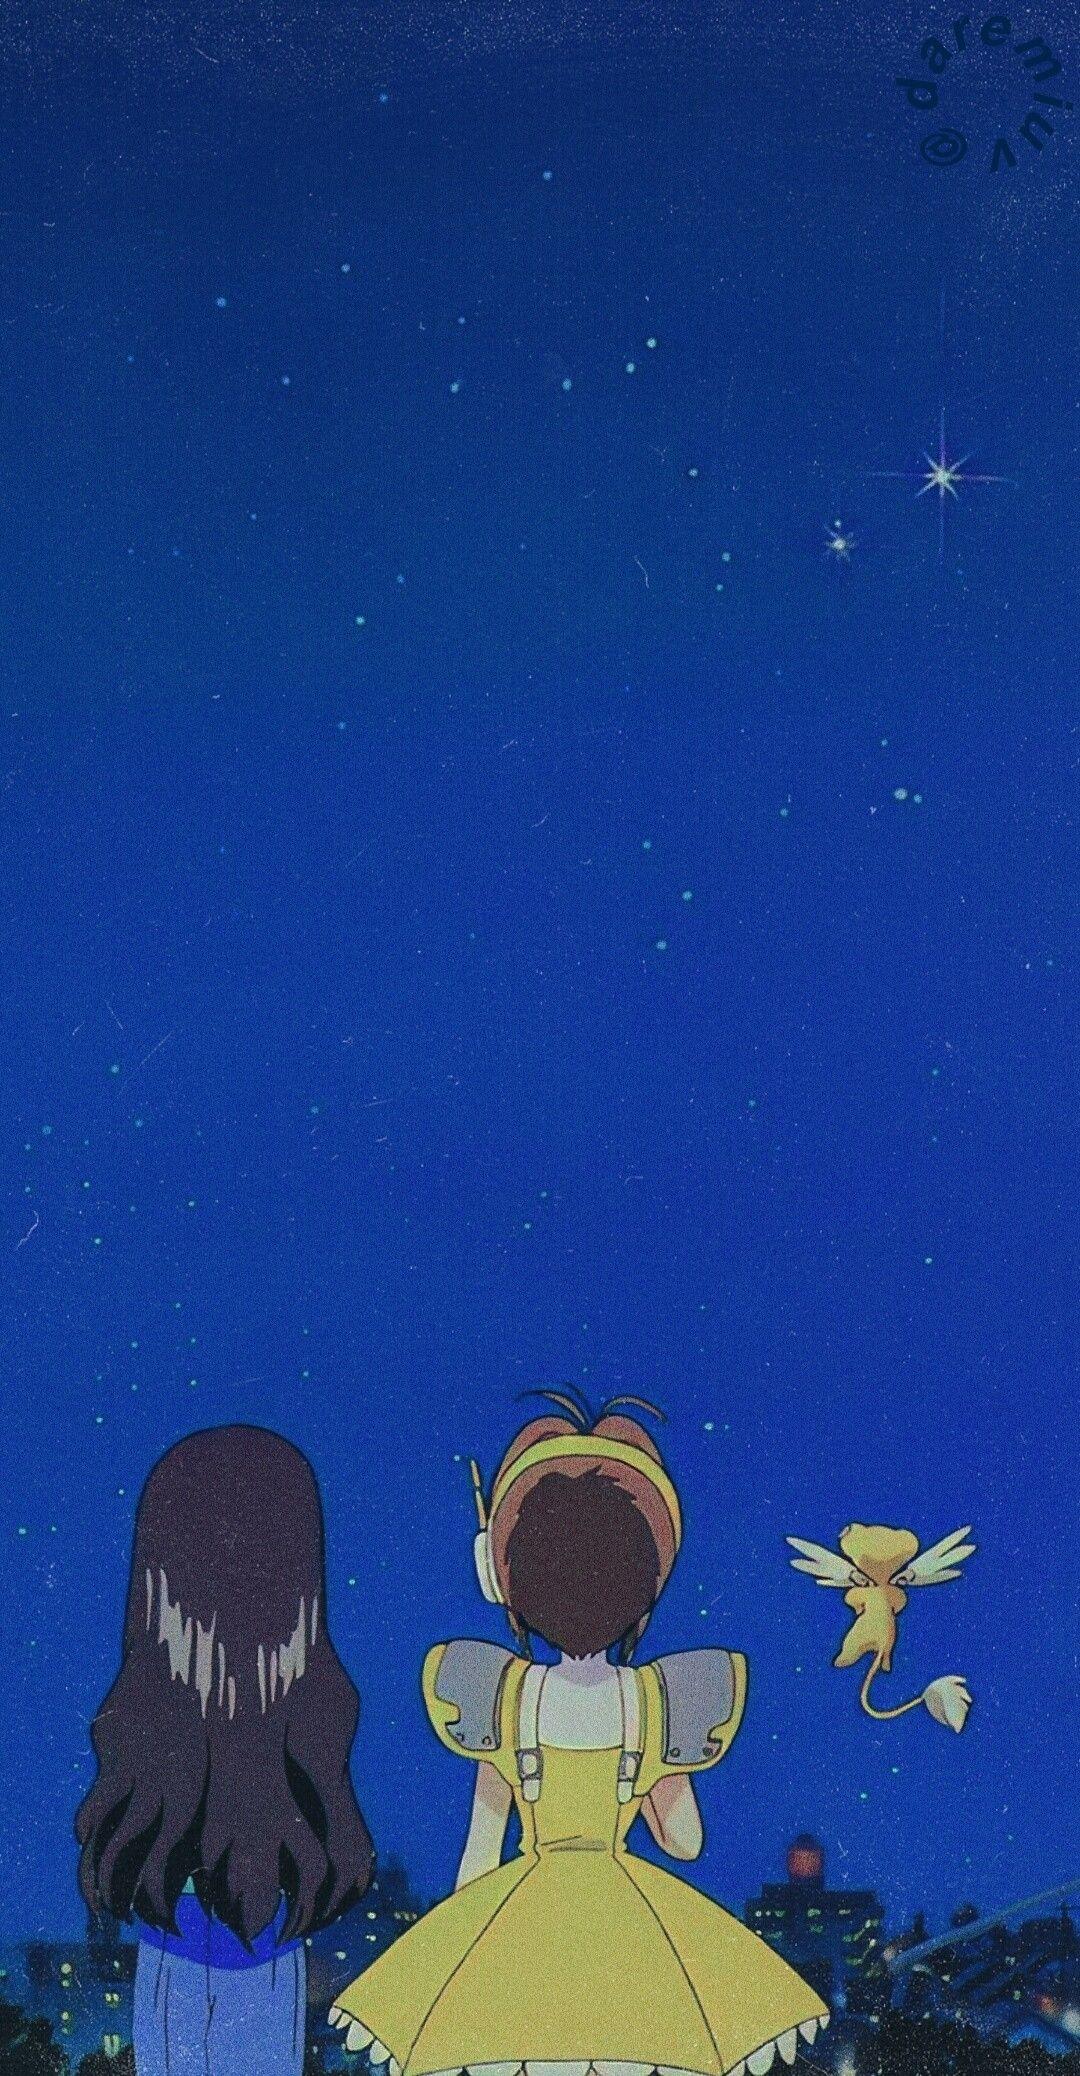 Anime Wallpaper Anime Wallpaper Iphone Wallpaper Tumblr Aesthetic Wallpaper Iphone Cute